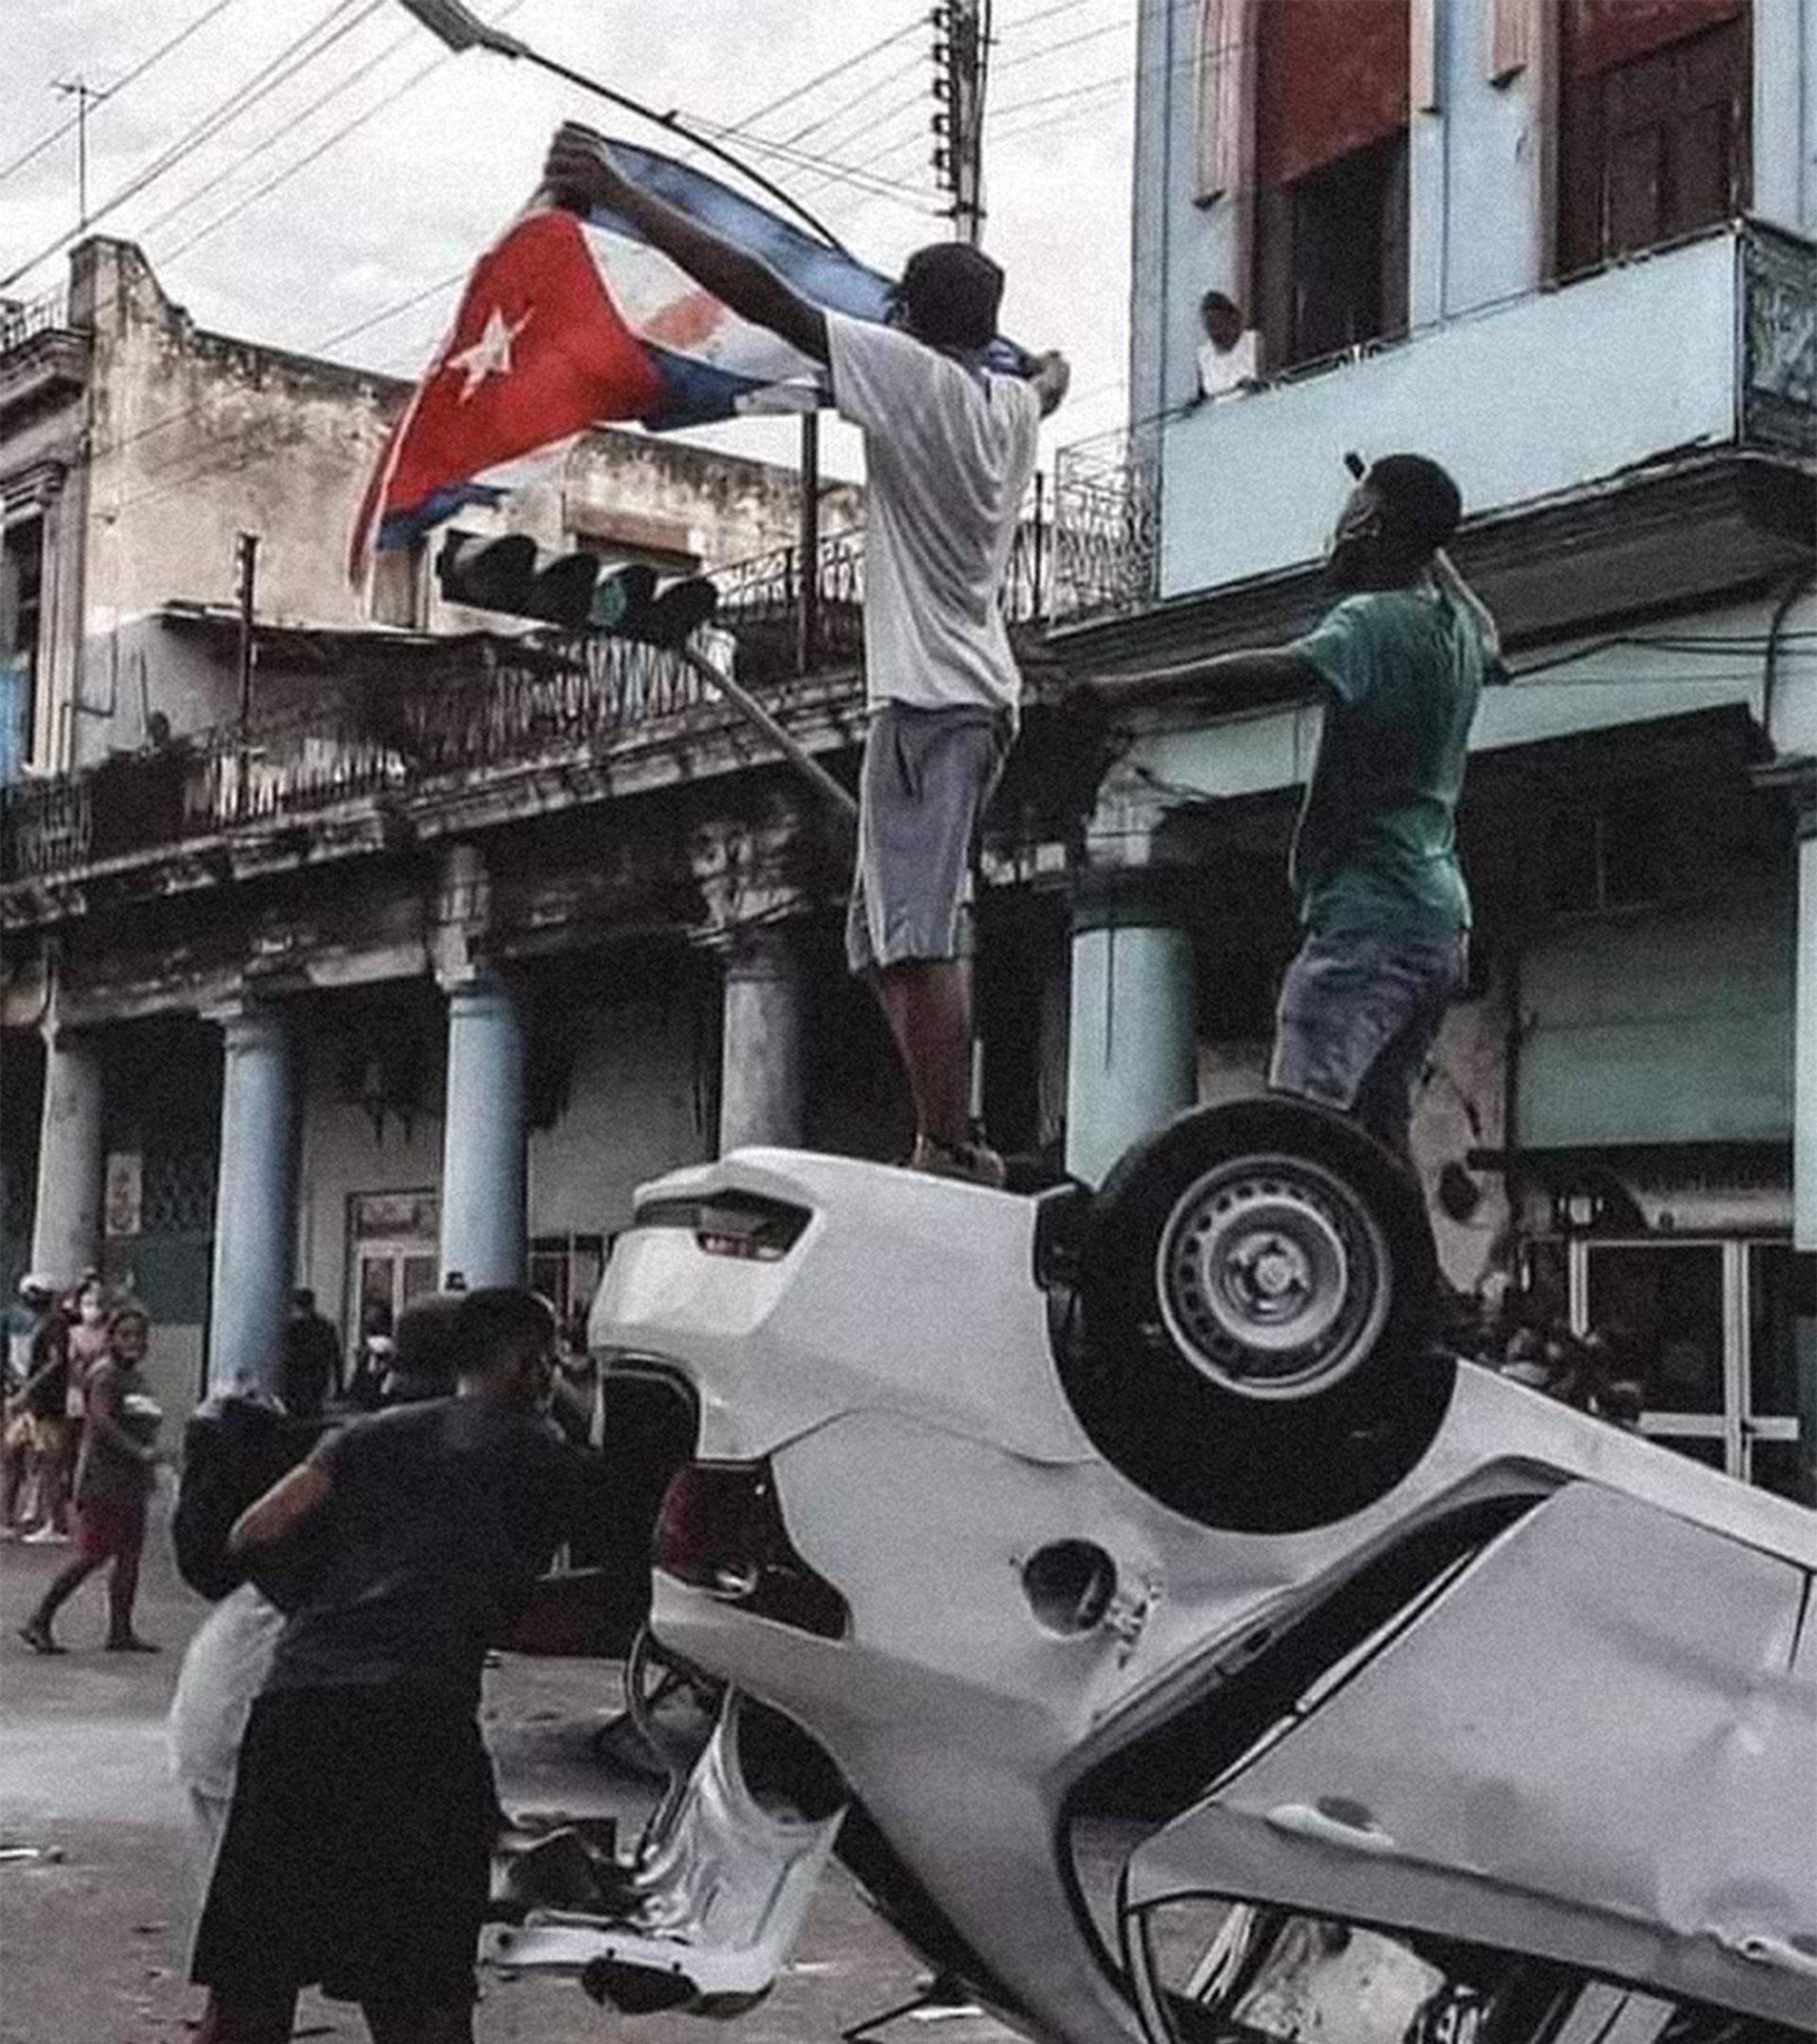 Foto icónica tomada en la esquina de Toyo, La Habana.